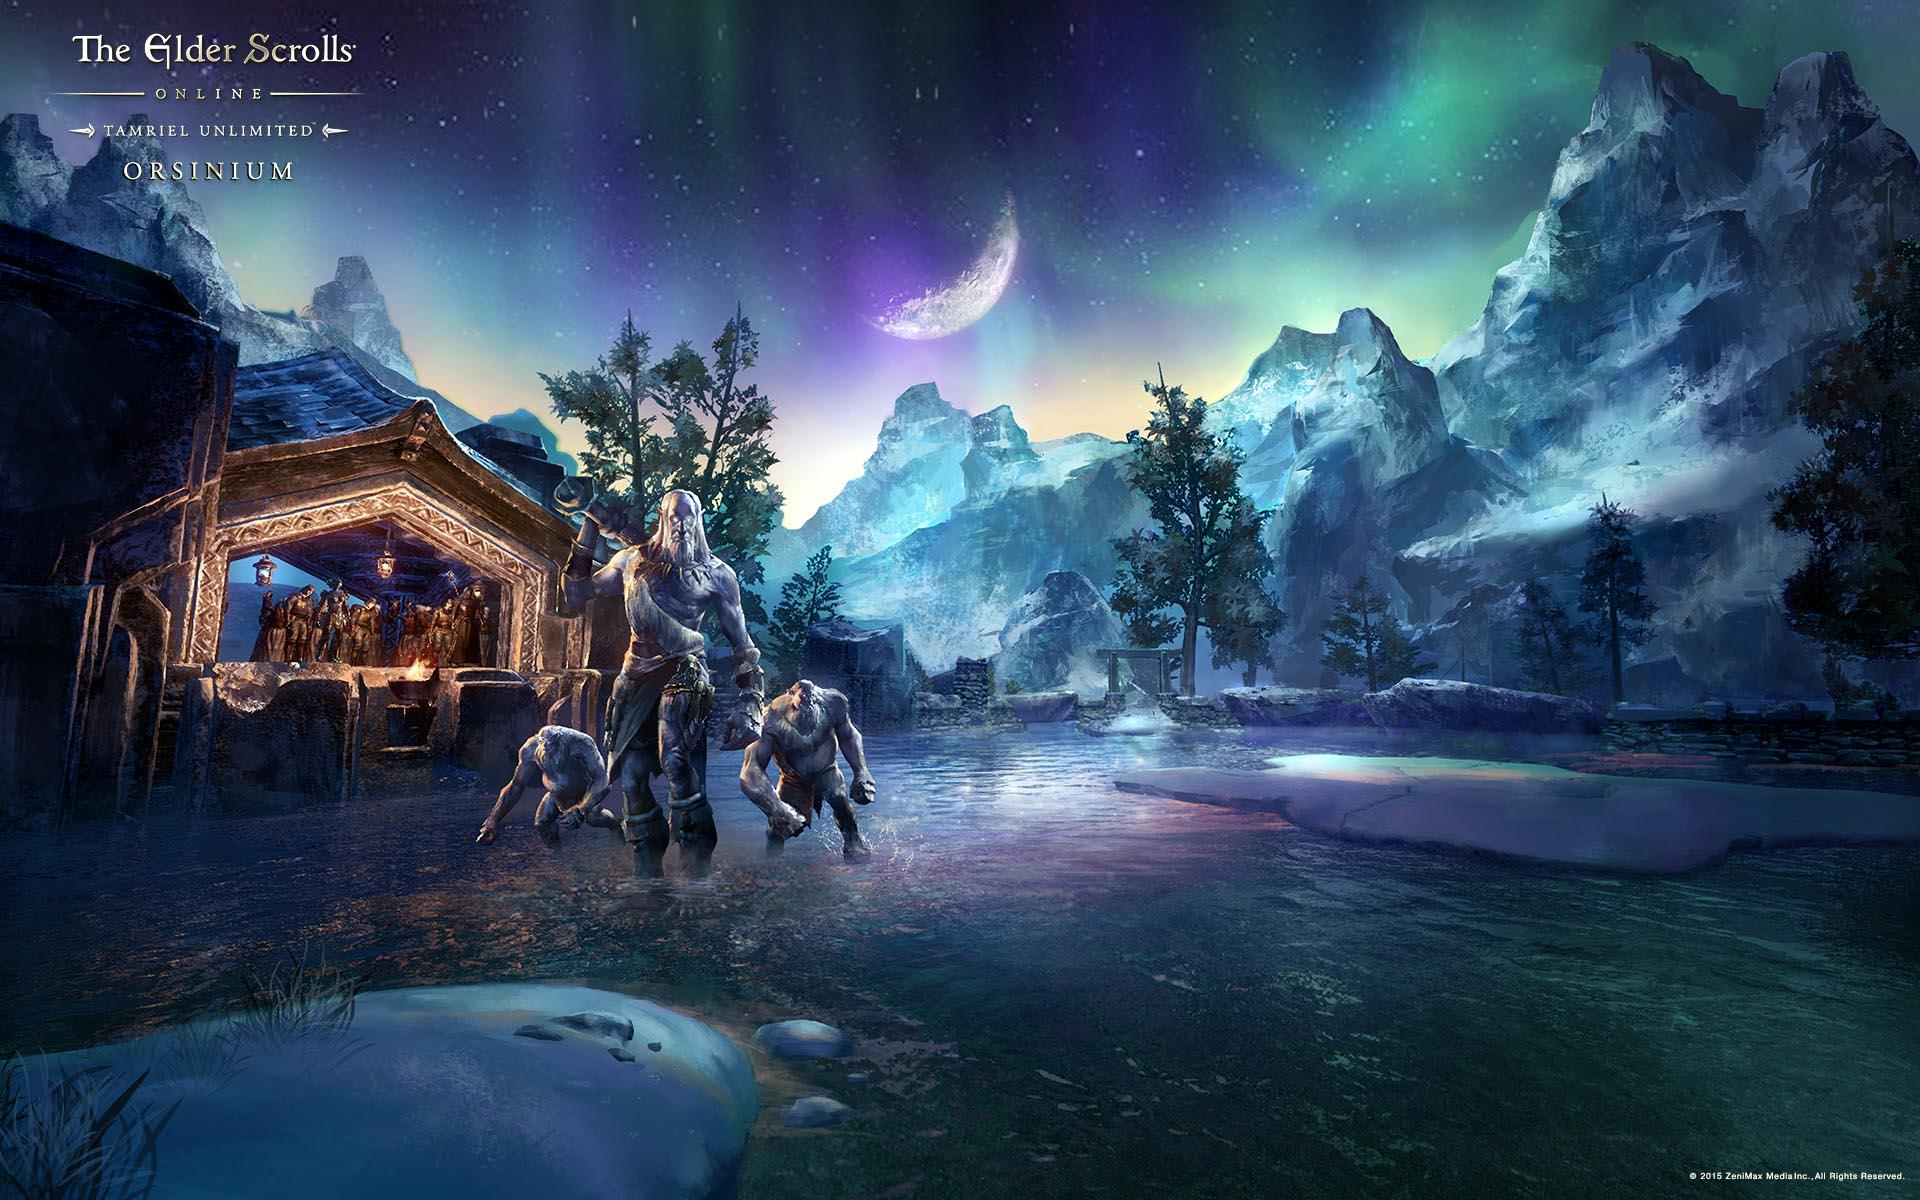 The Maelstrom Arena Concept Art